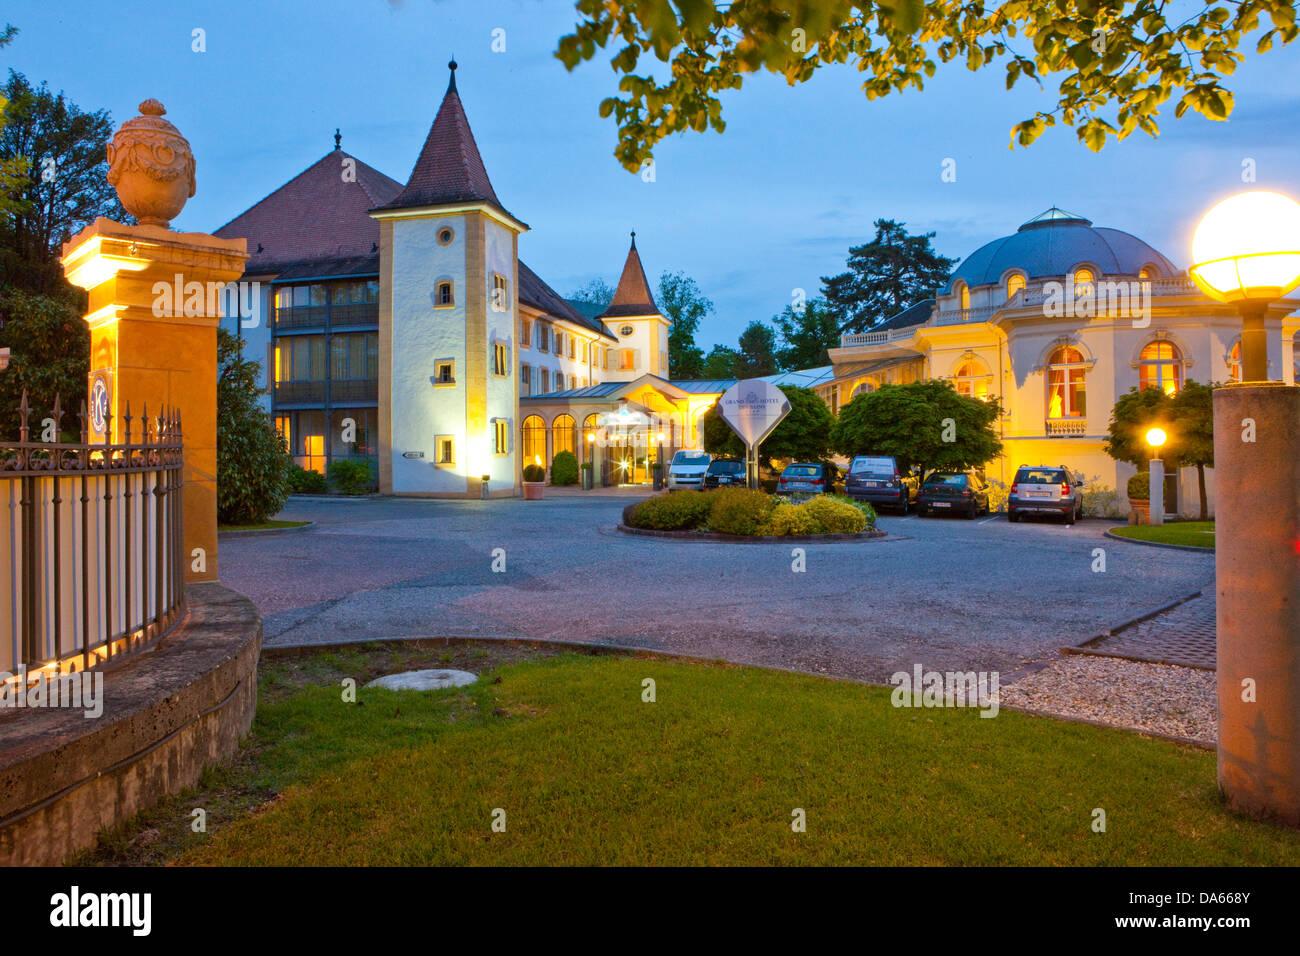 Grand Hotel, Bains, Yverdon, town, city, canton, VD, Vaud, West Switzerland, catering, restaurant, hotel, Switzerland, - Stock Image